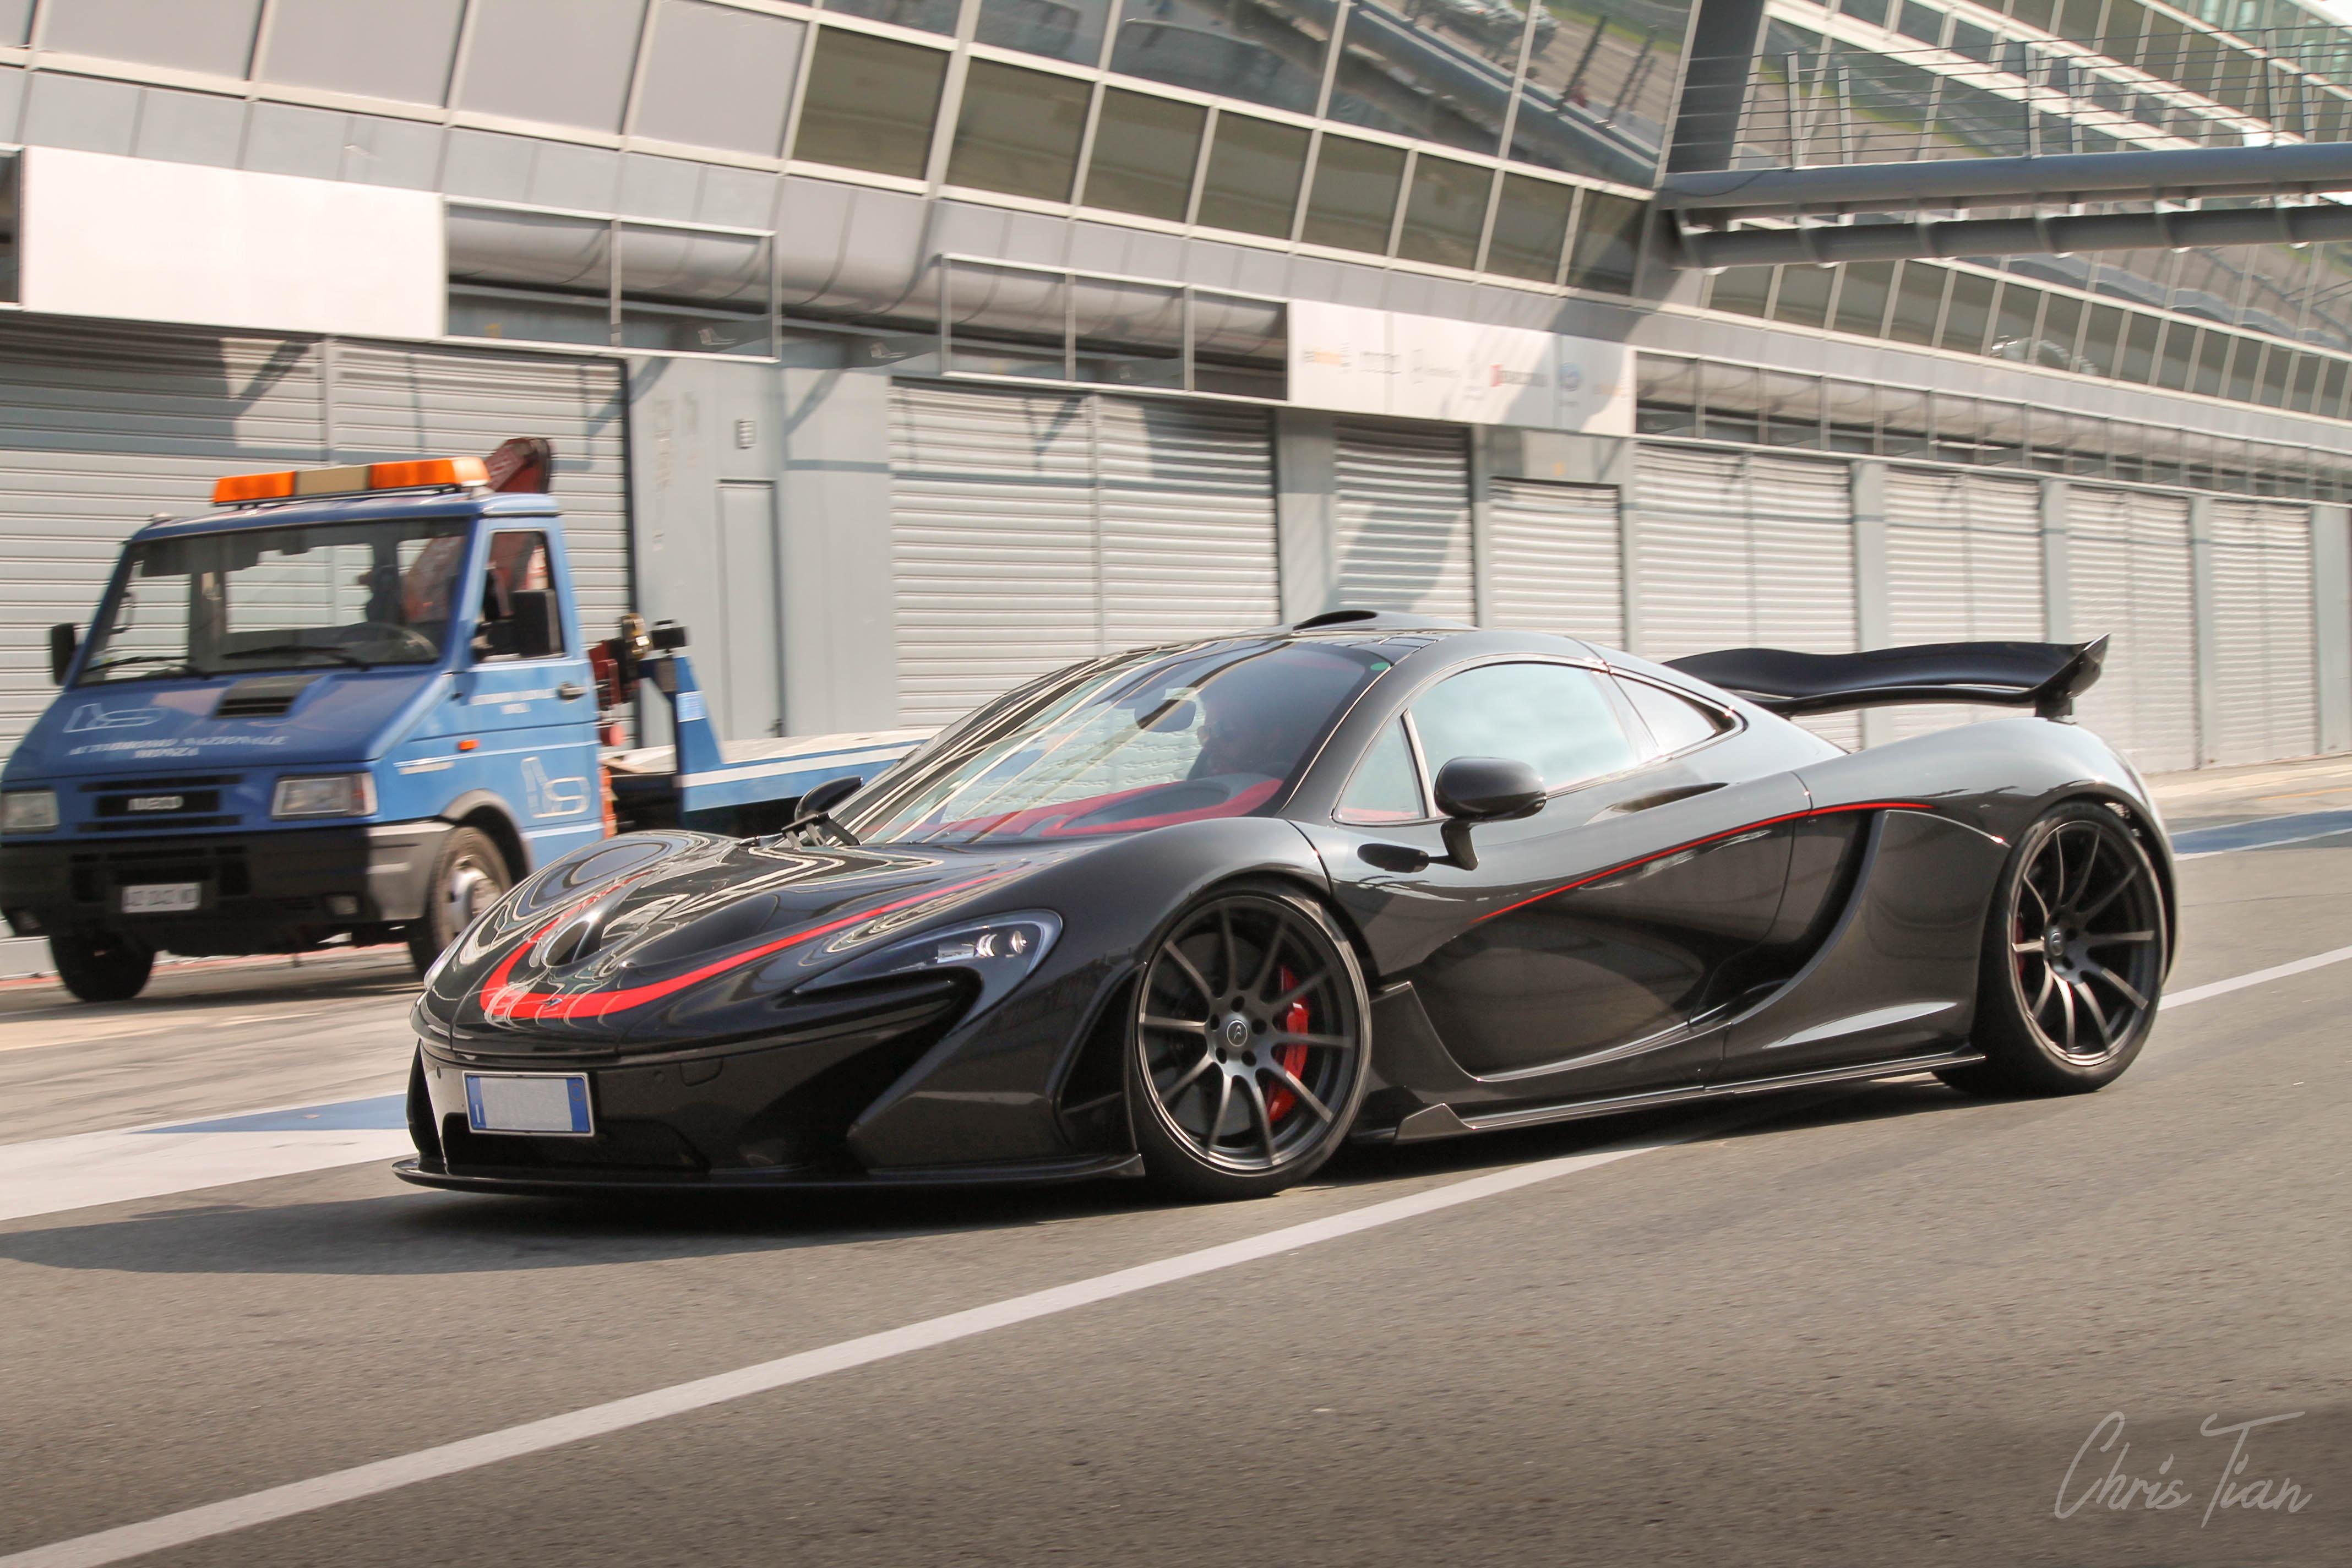 Canon McLaren Hd P1 Pitlane Monza TopGear Mso Hypercar Christino96 Tgcup